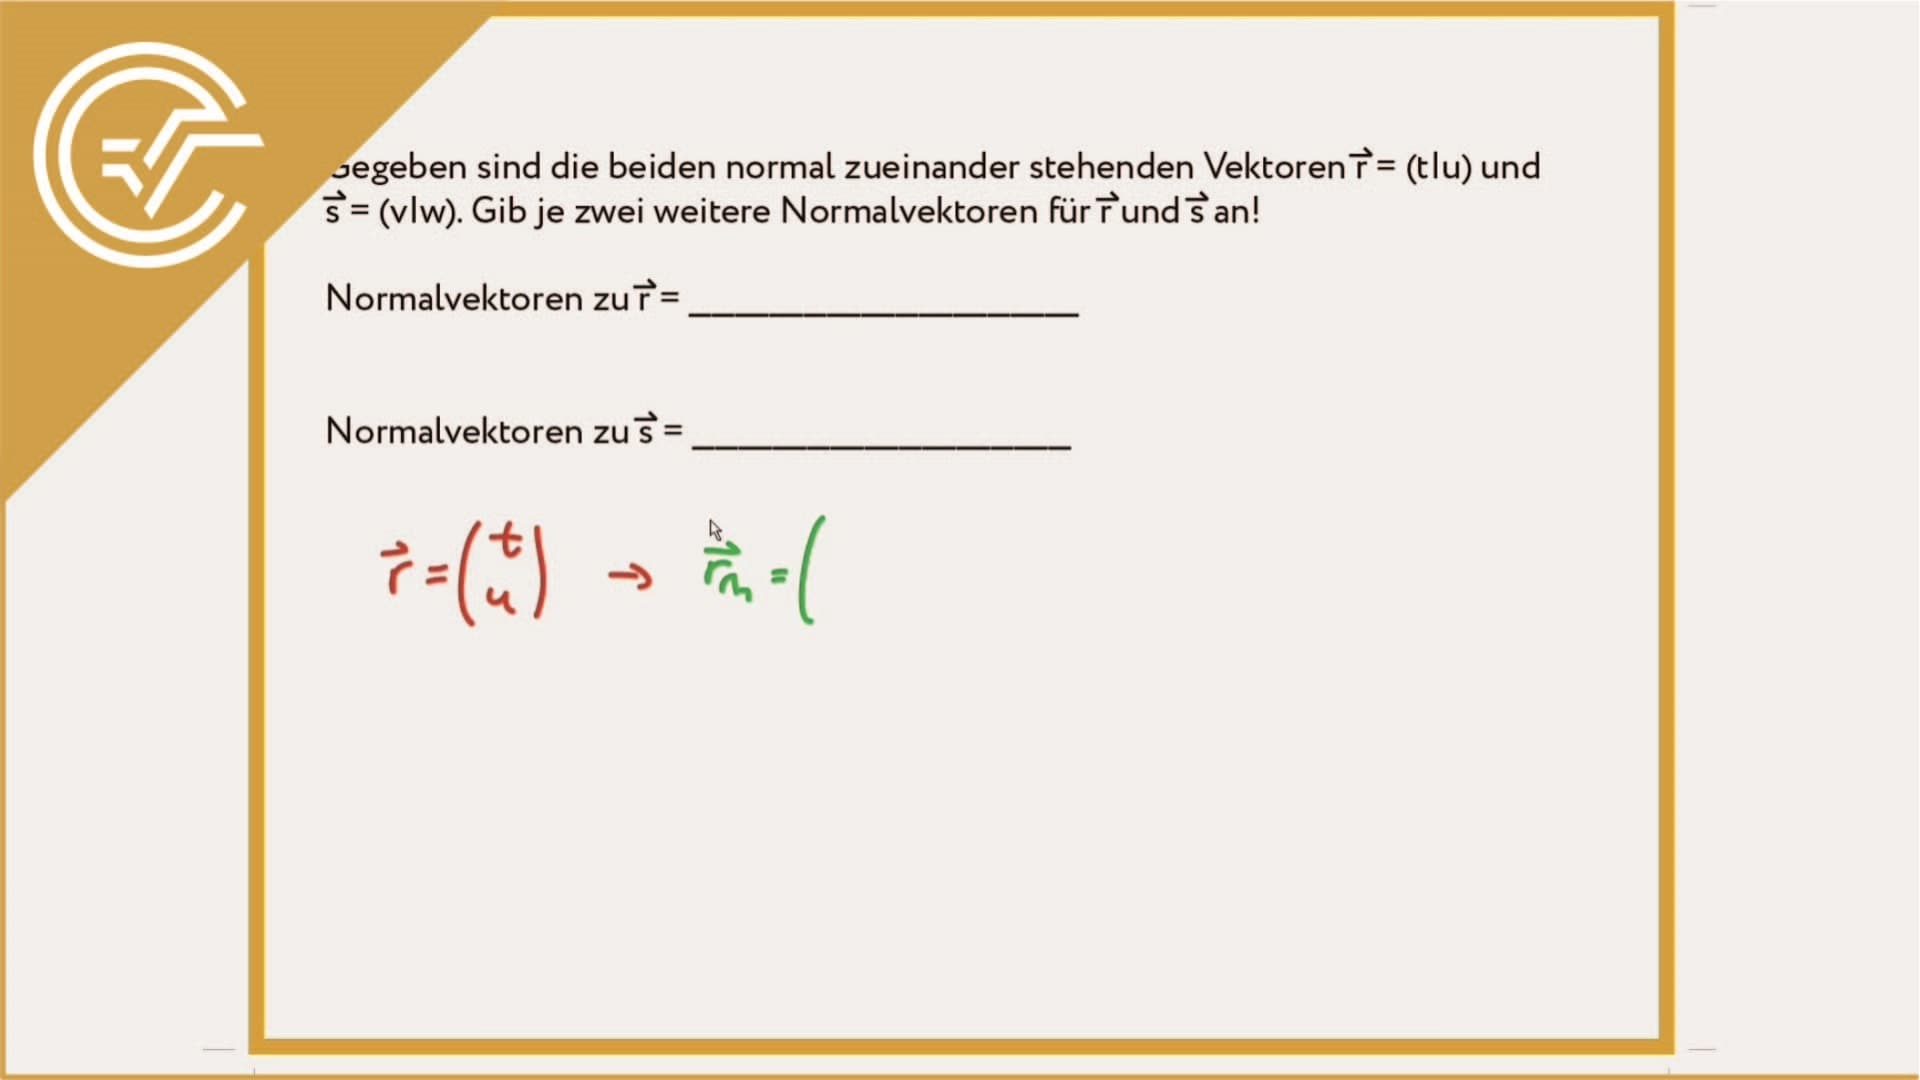 AG 3.5 - Normalvektor 8